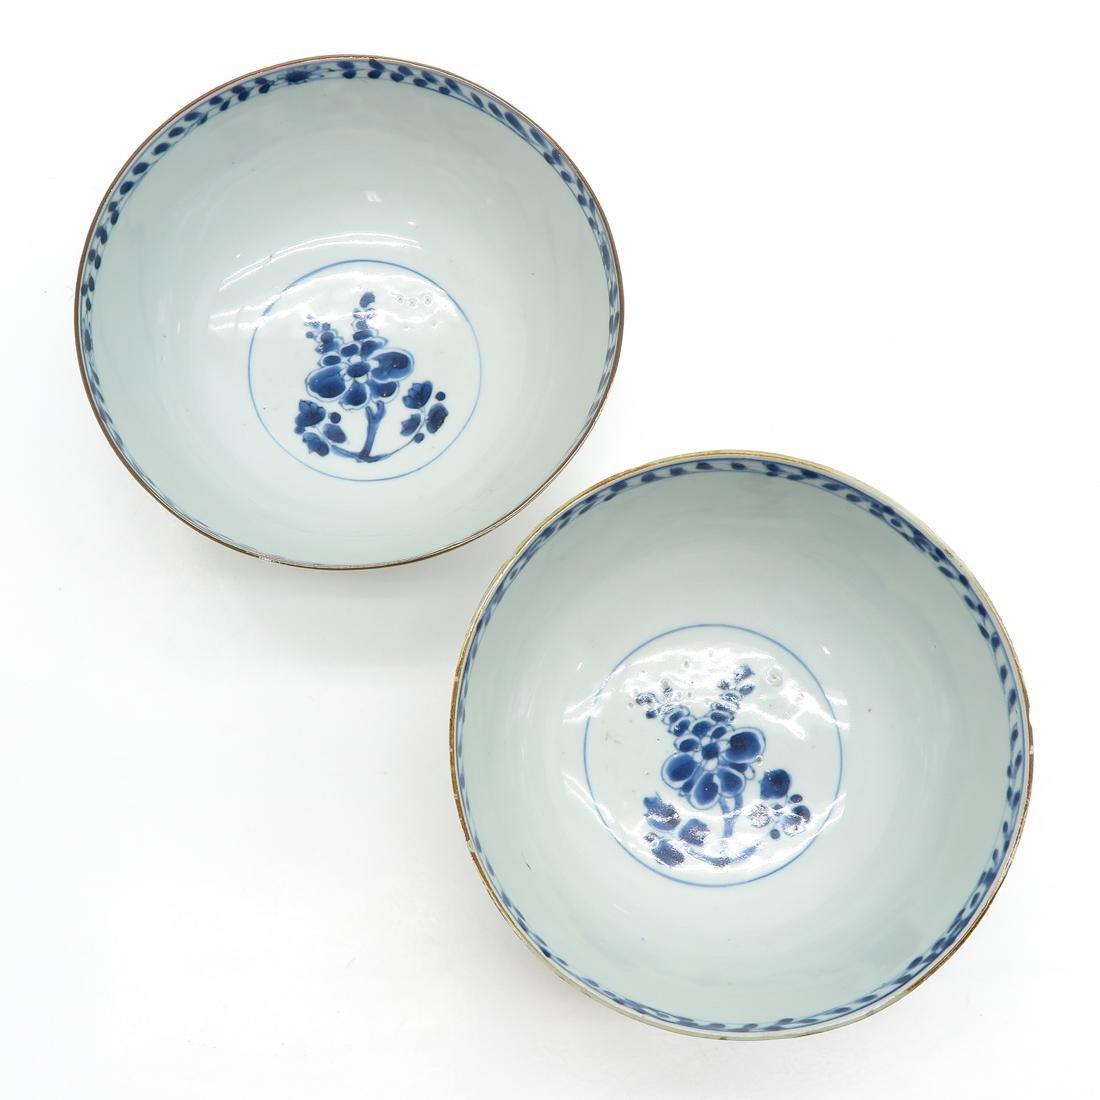 Lot of 2 Bowls - 5